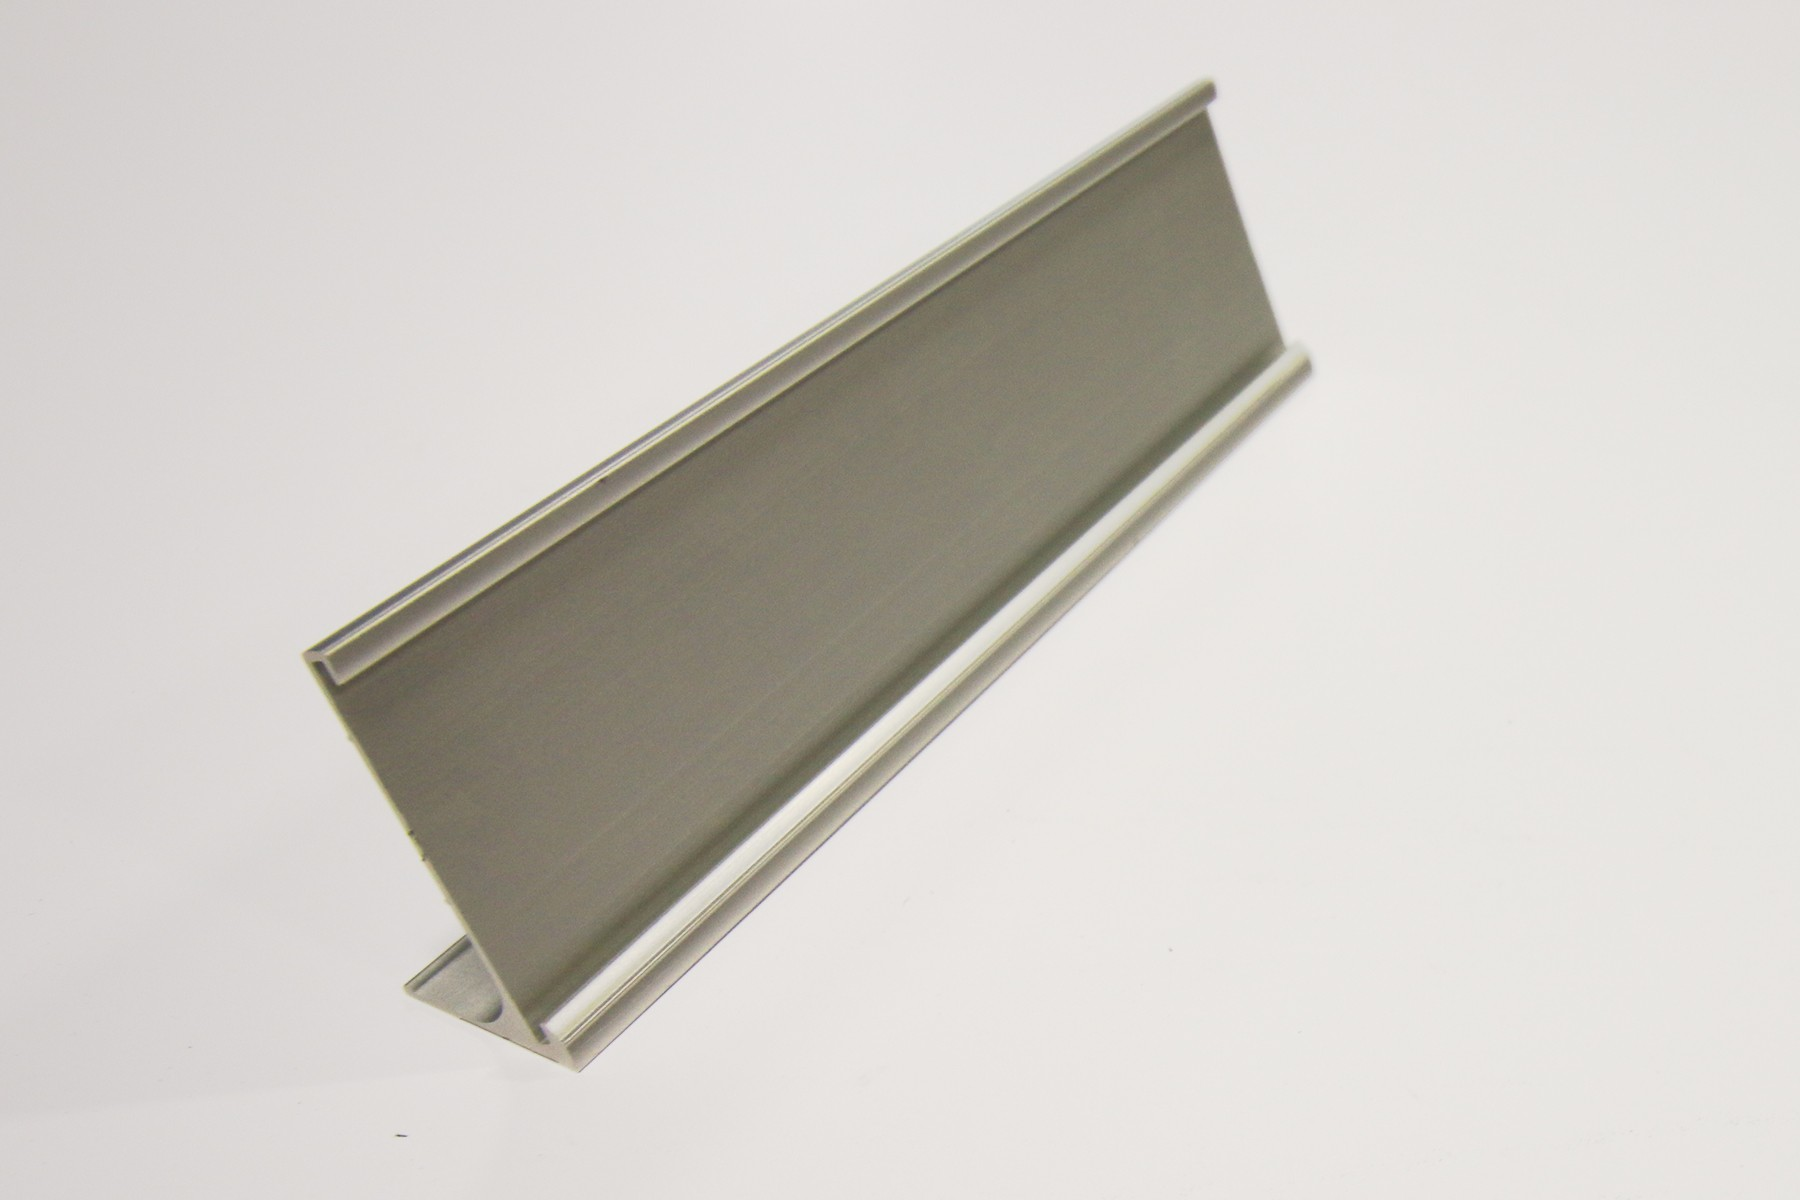 2 x 10 Desk Holder, Stn Silver